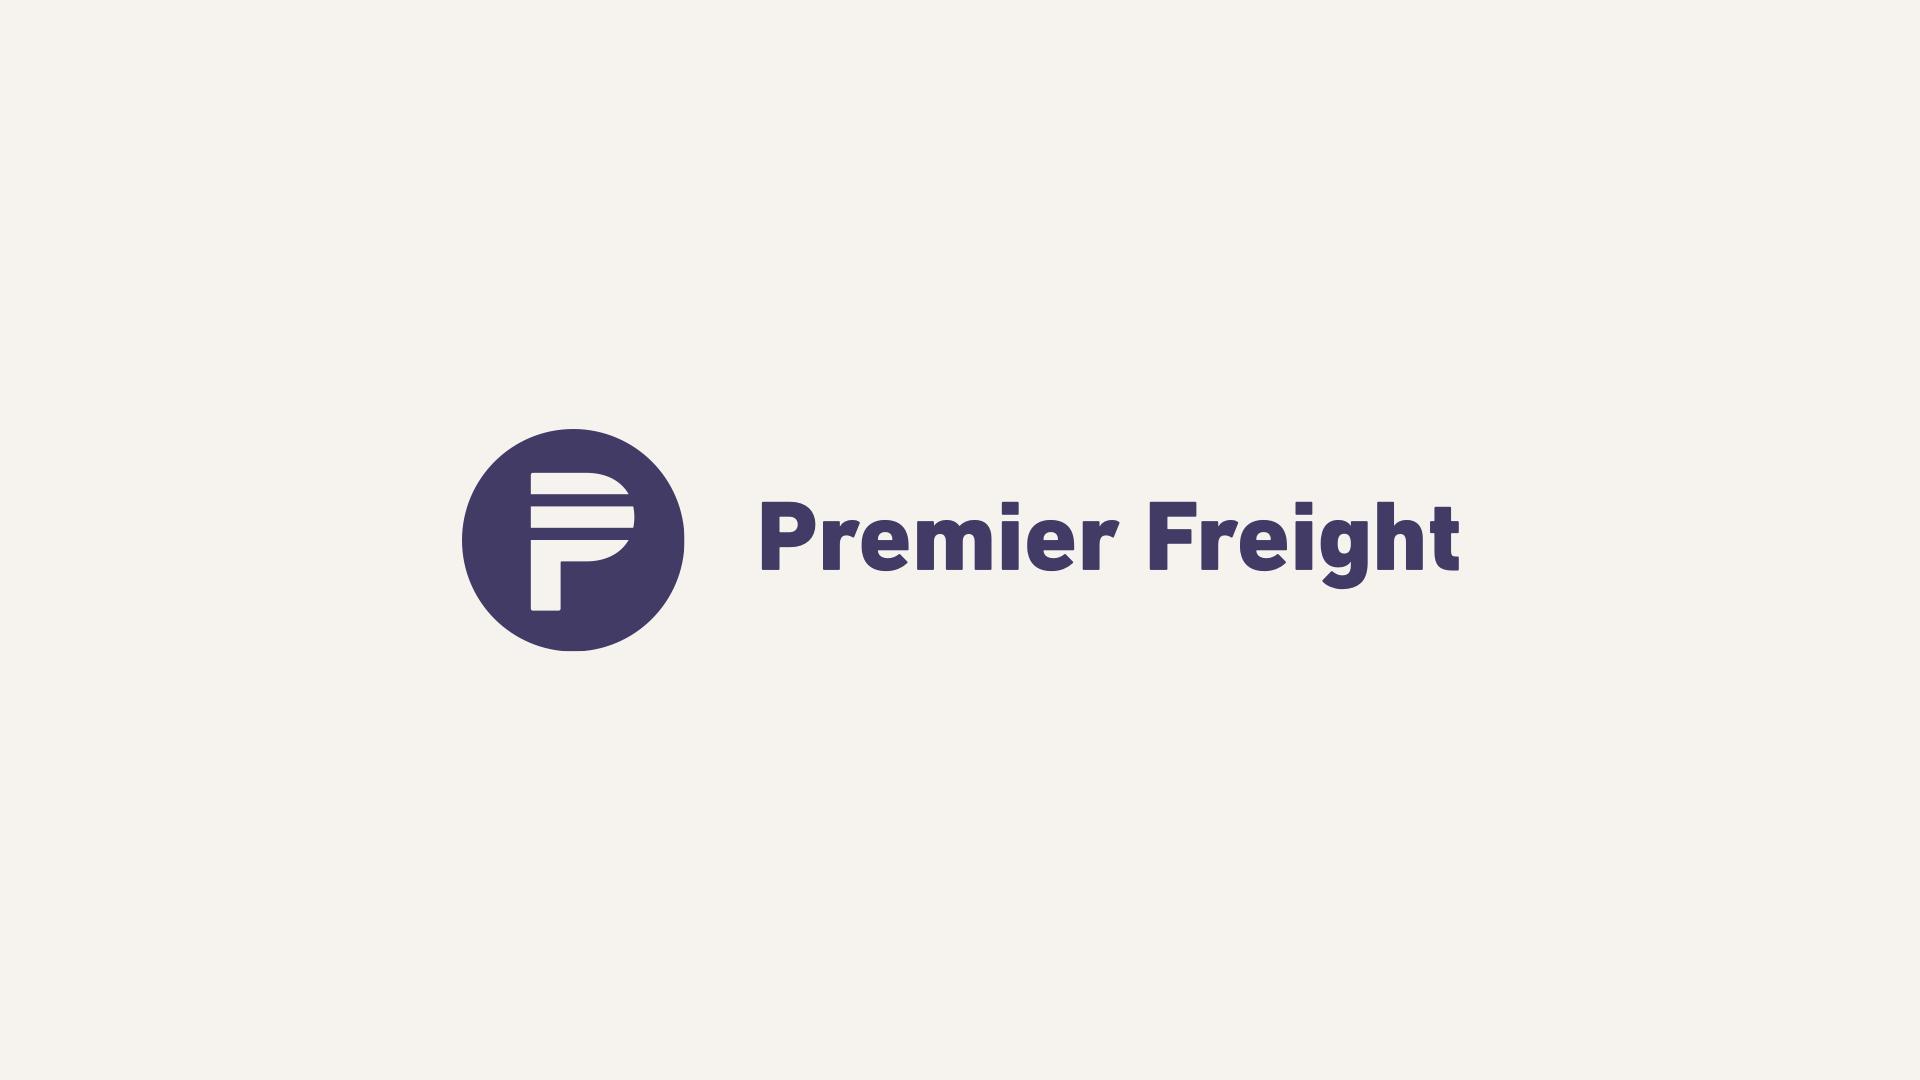 Premier Freight Logo: Horizontal Lockup